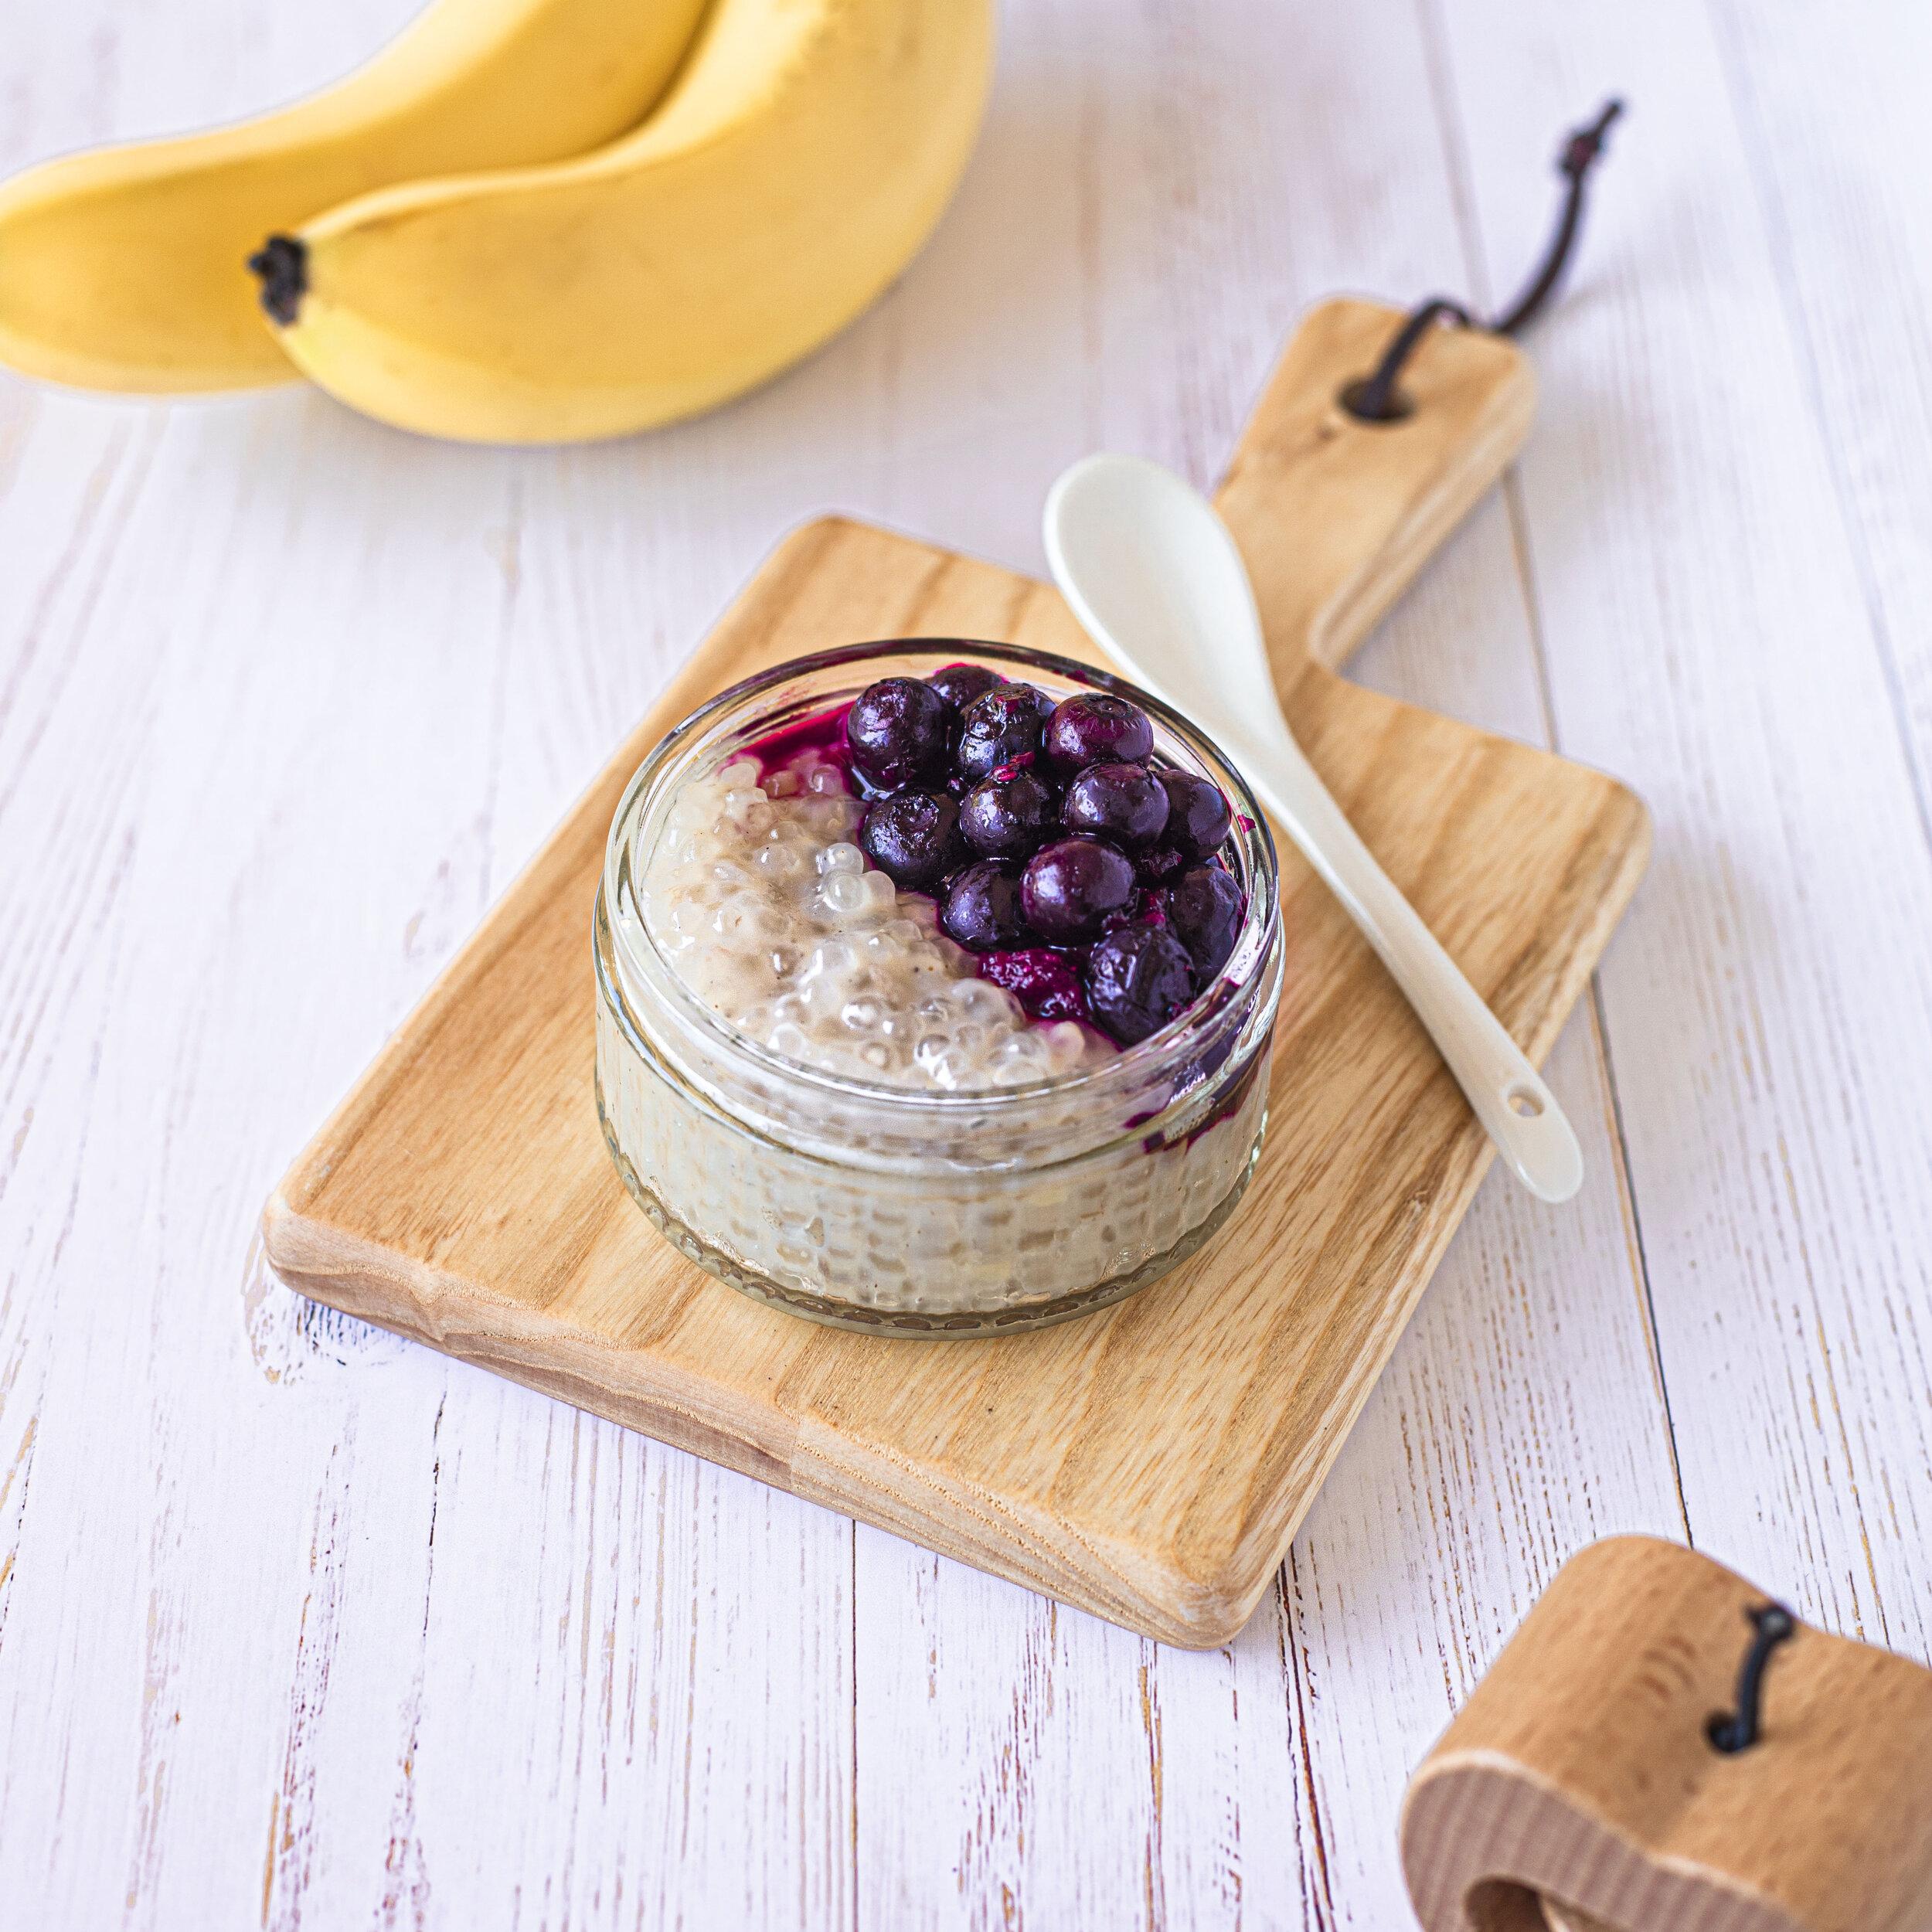 Coconut and banana sago